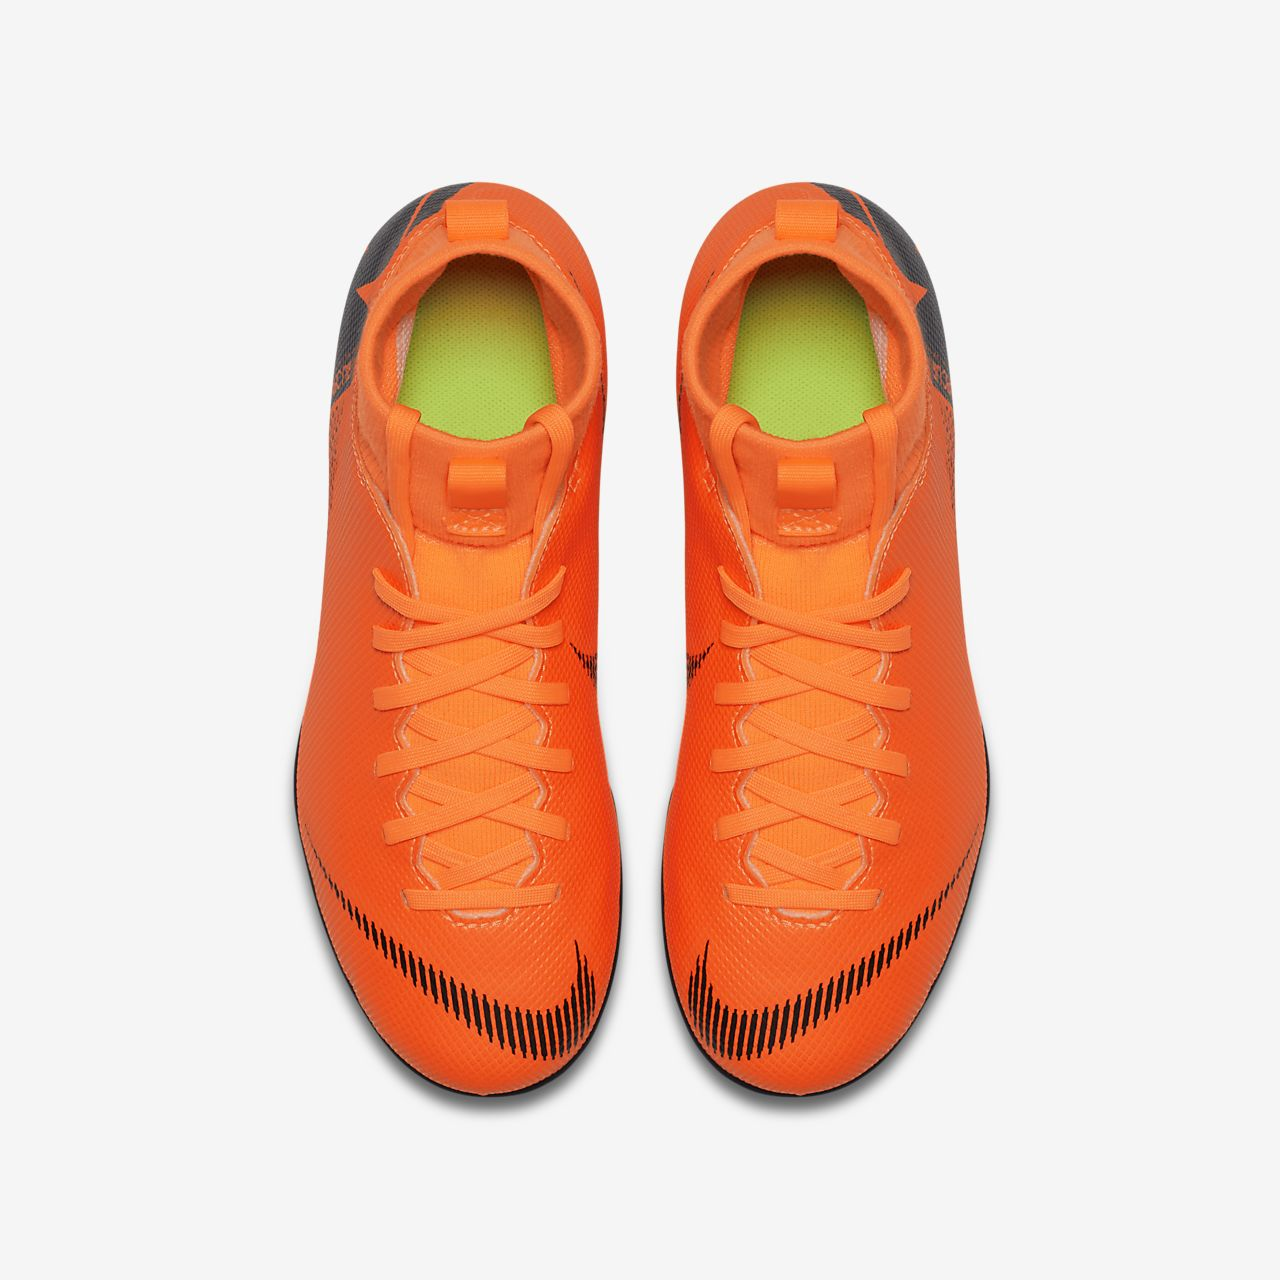 b9efdd3771 ... chaussure de football multi terrains à crampons nike jr. mercurial  superfly vi club mg